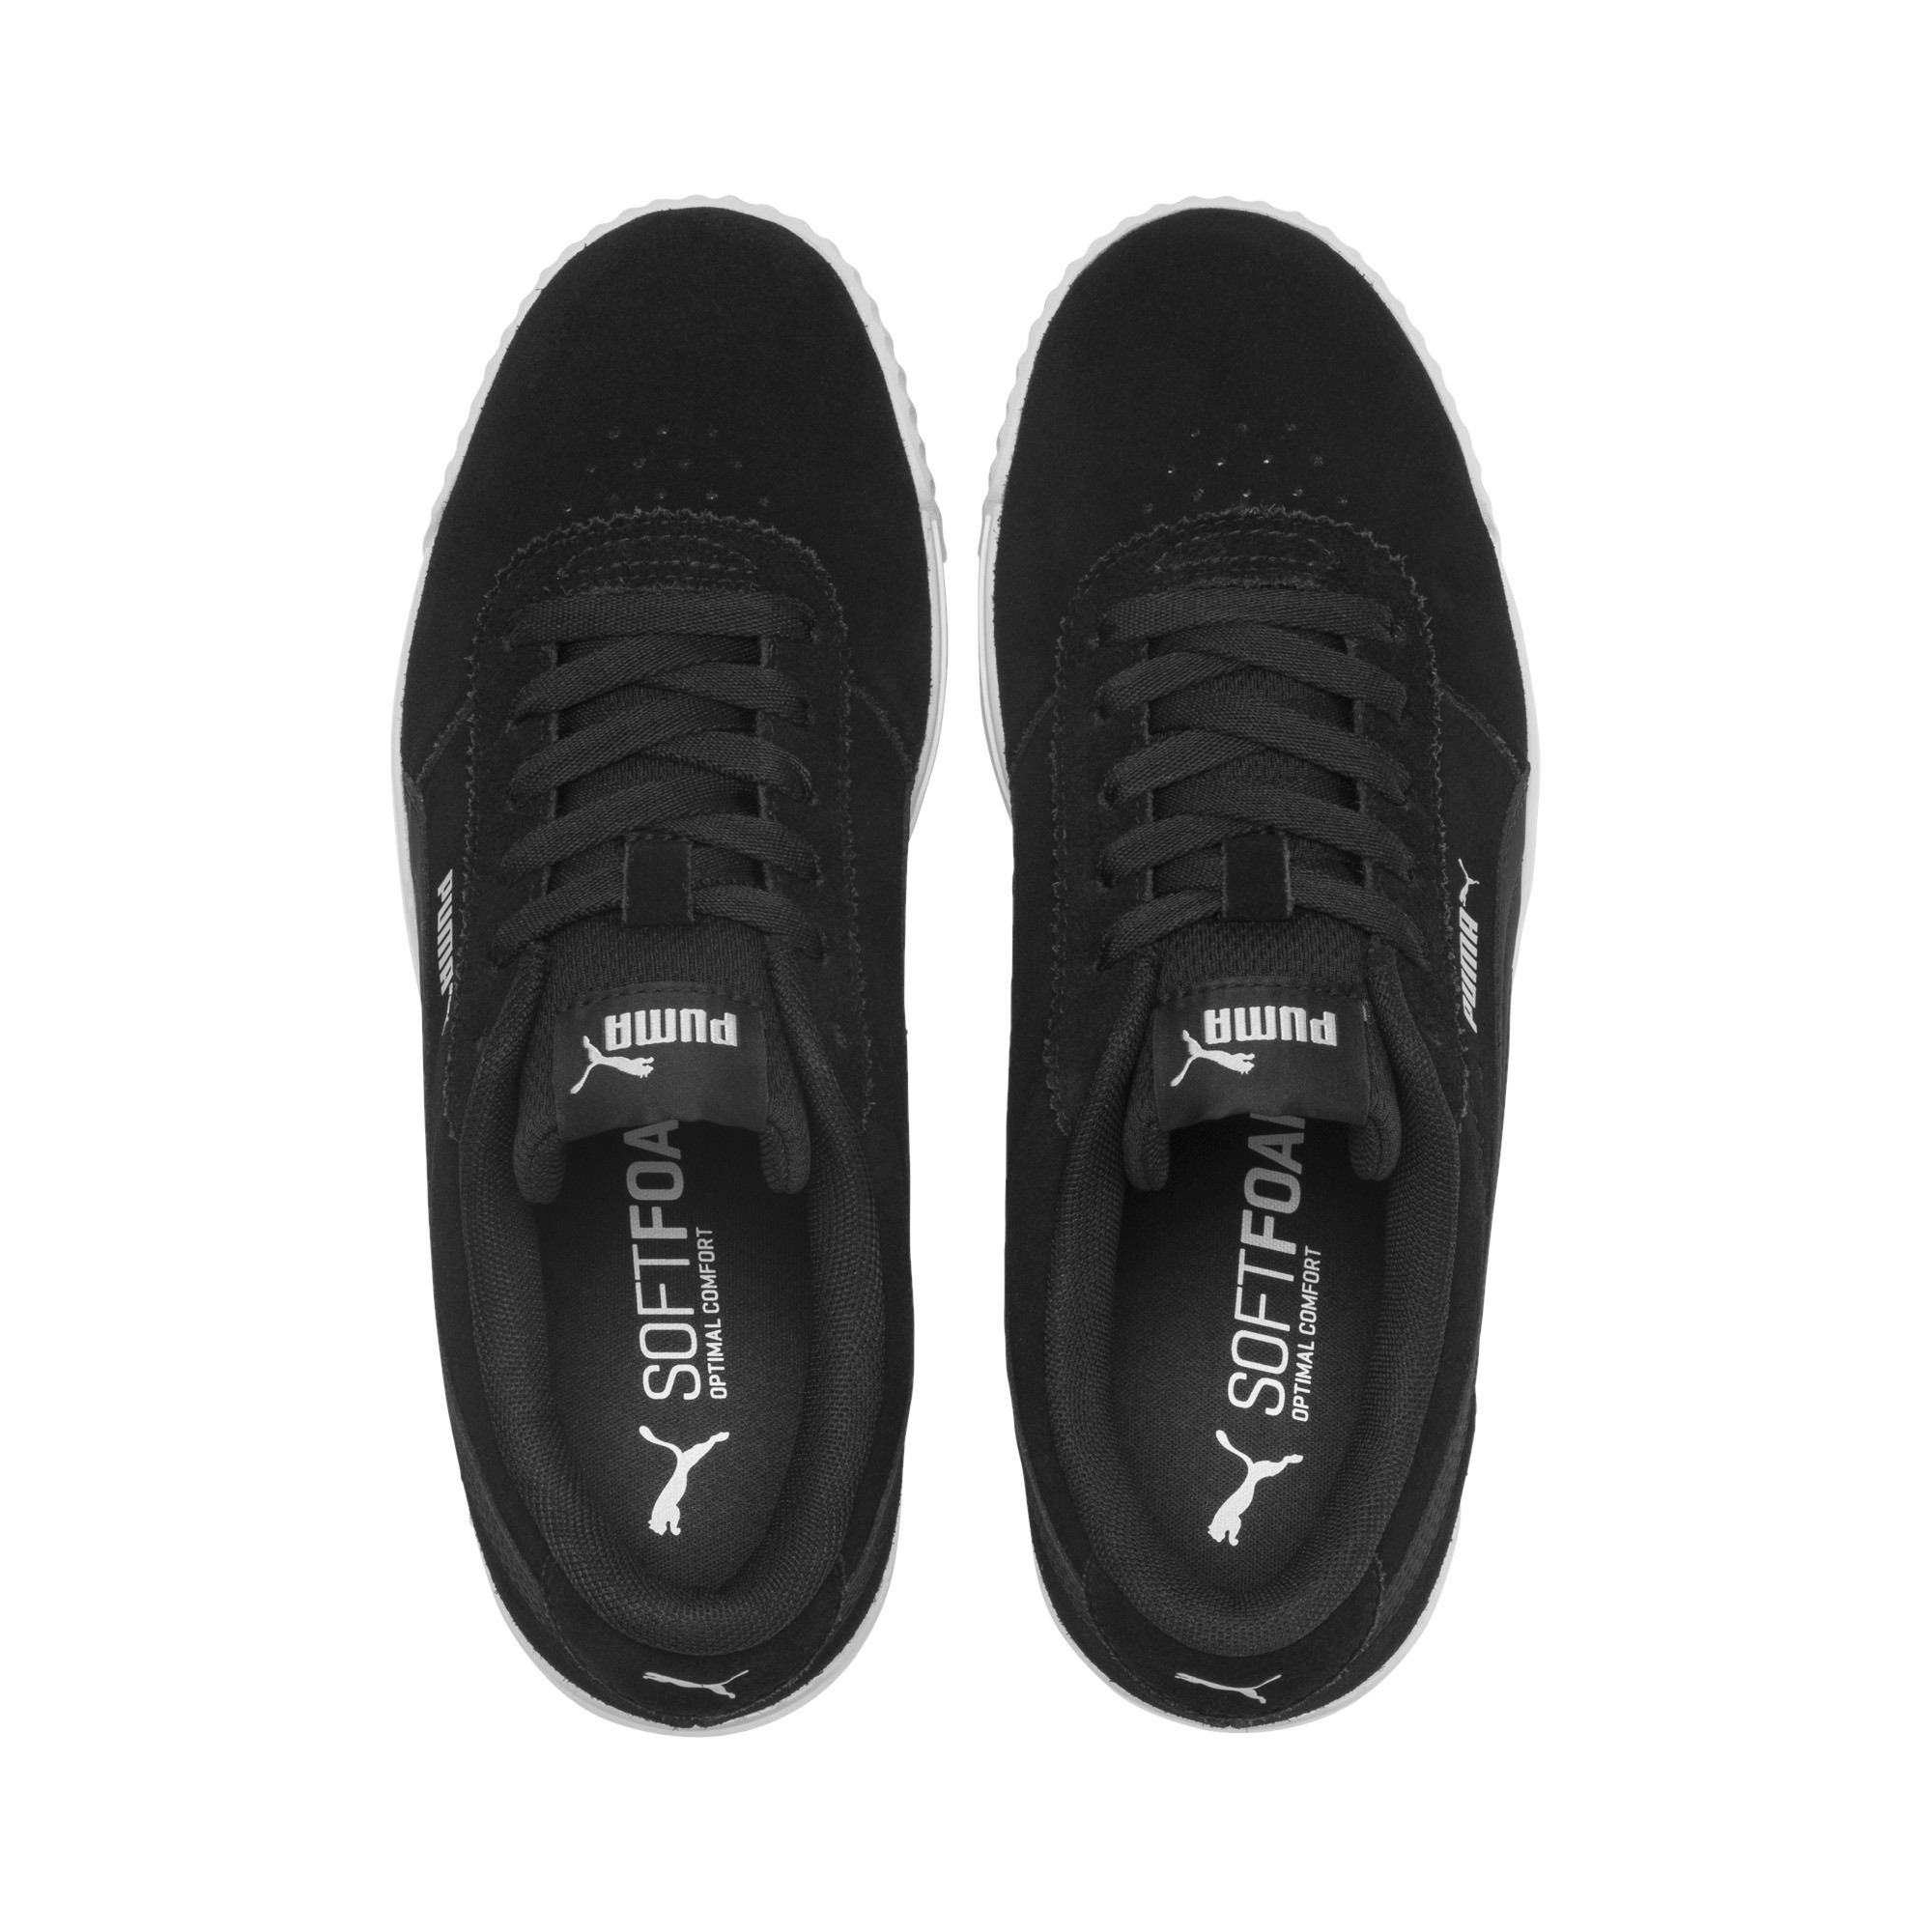 PUMA-Women-039-s-Carina-Slim-Suede-Sneakers thumbnail 22